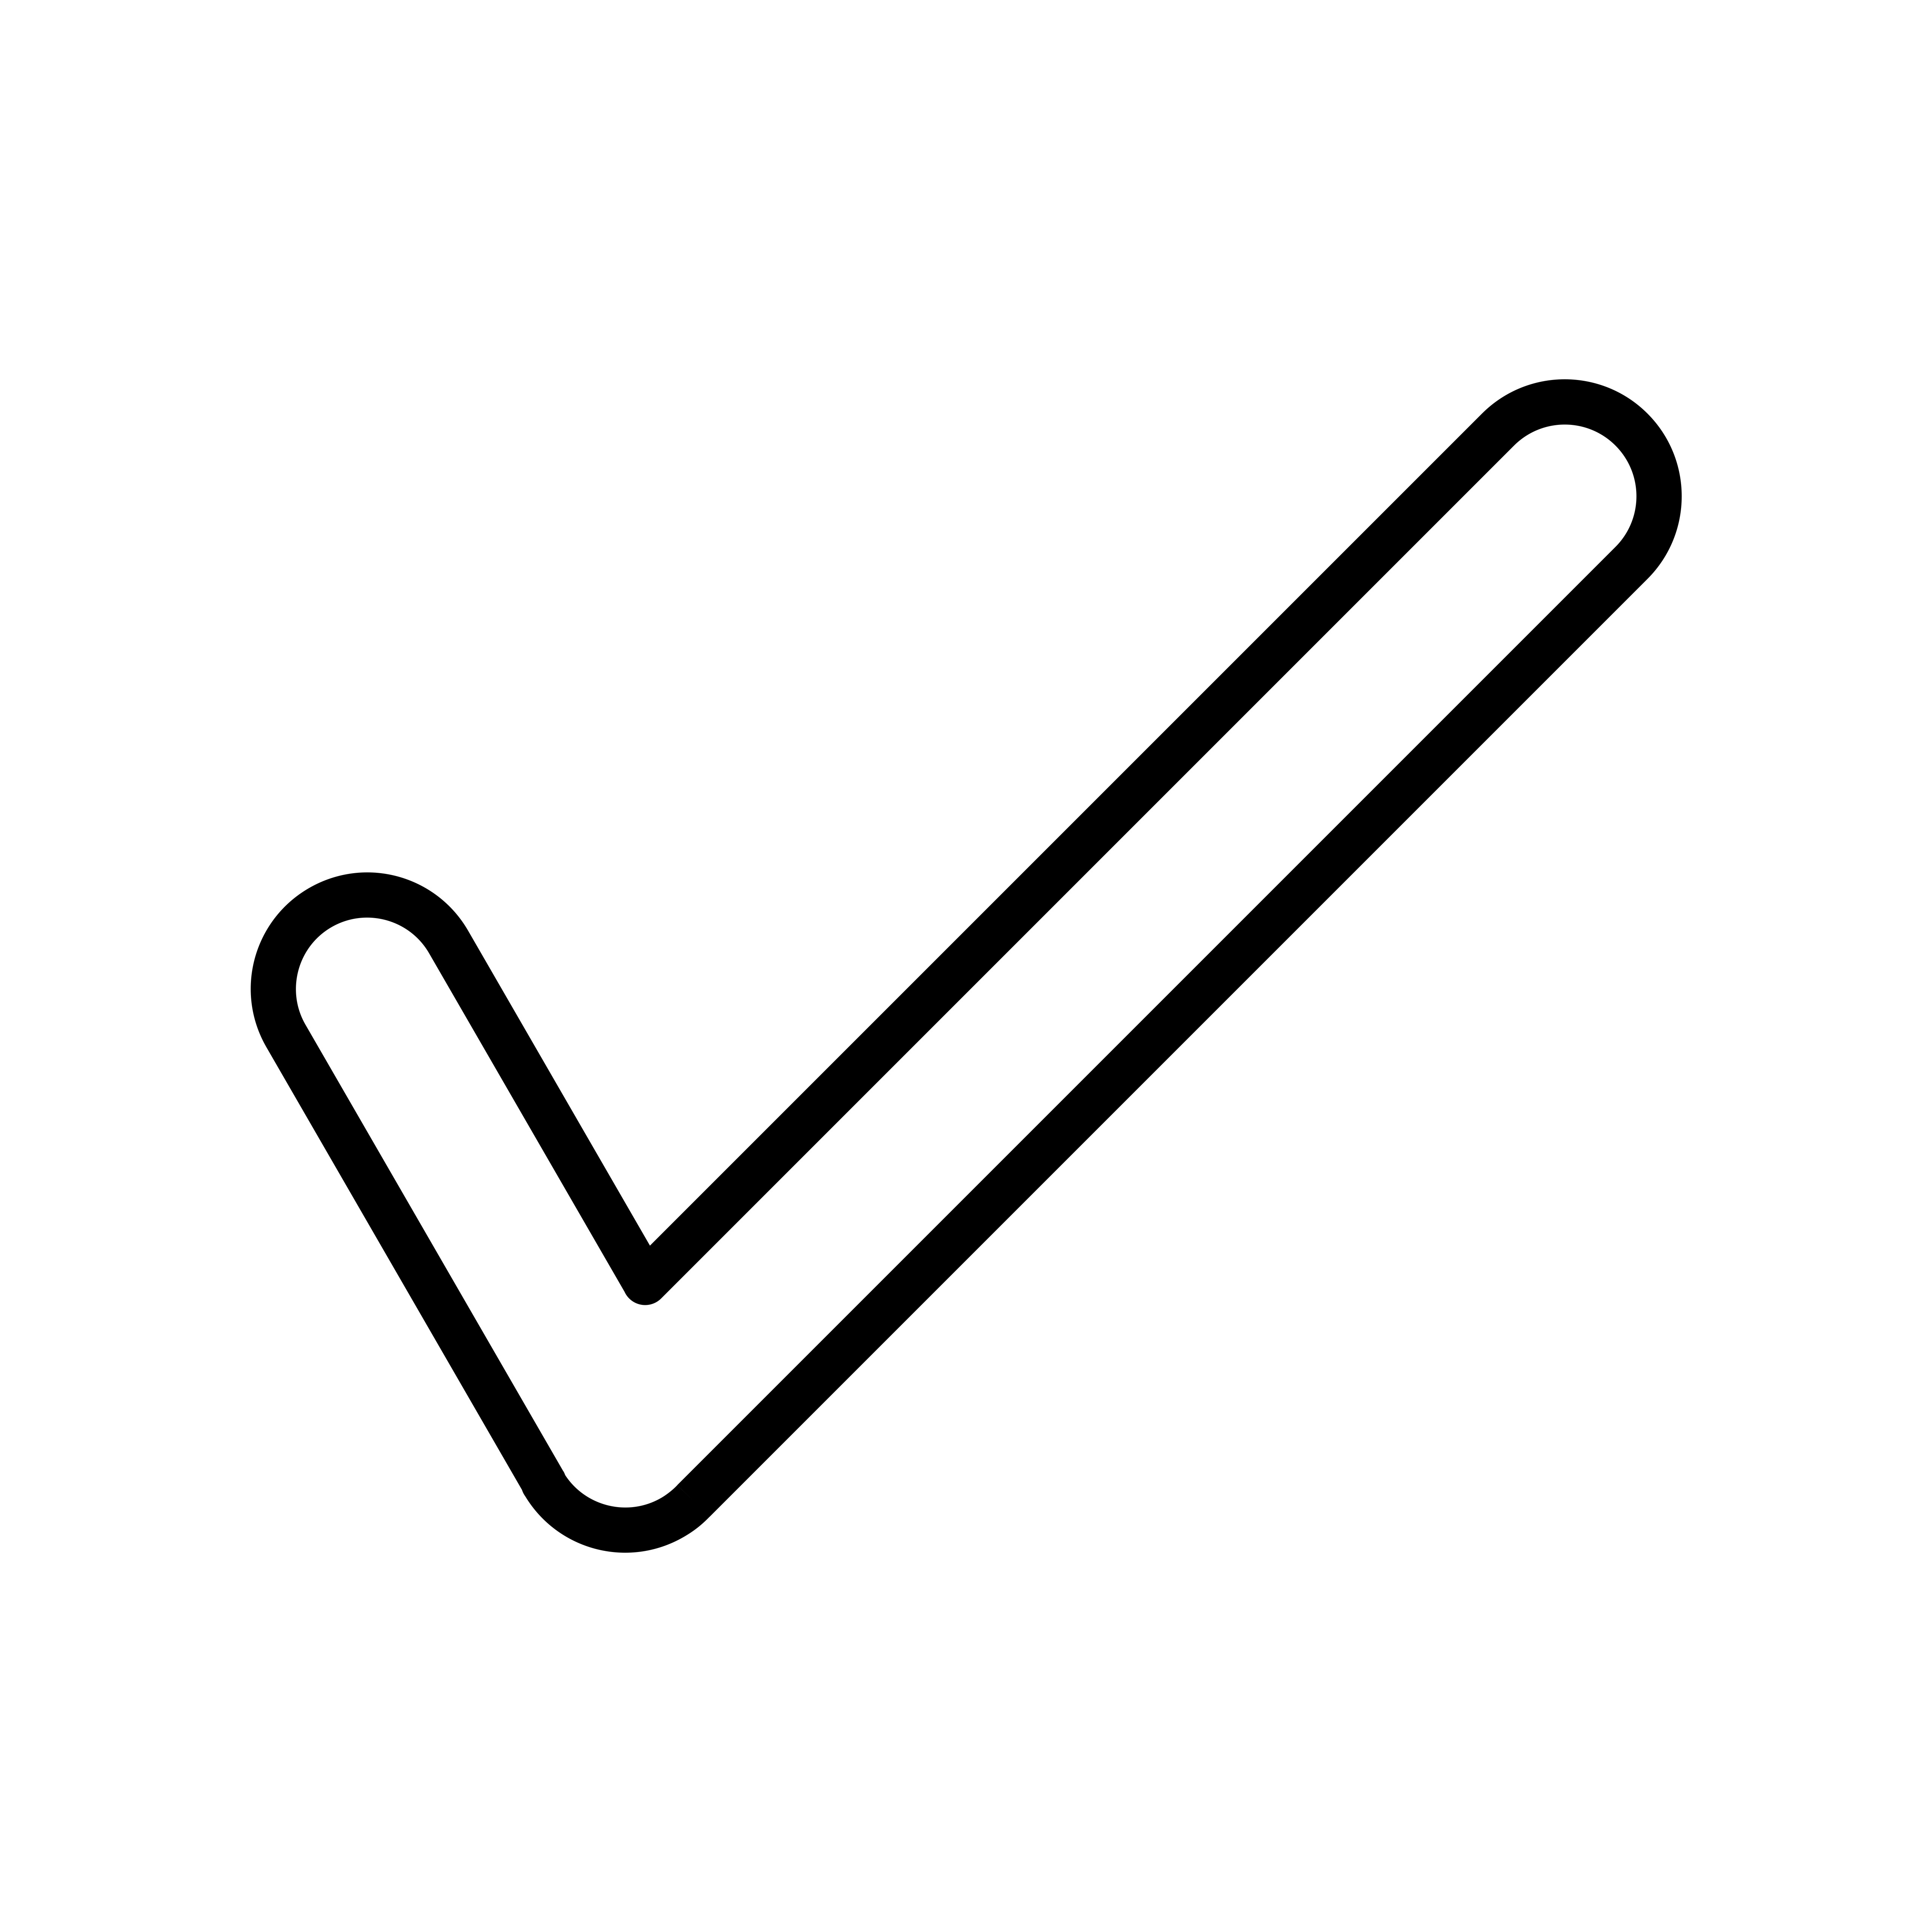 Ticks Free Vector Art - (2365 Free Downloads)